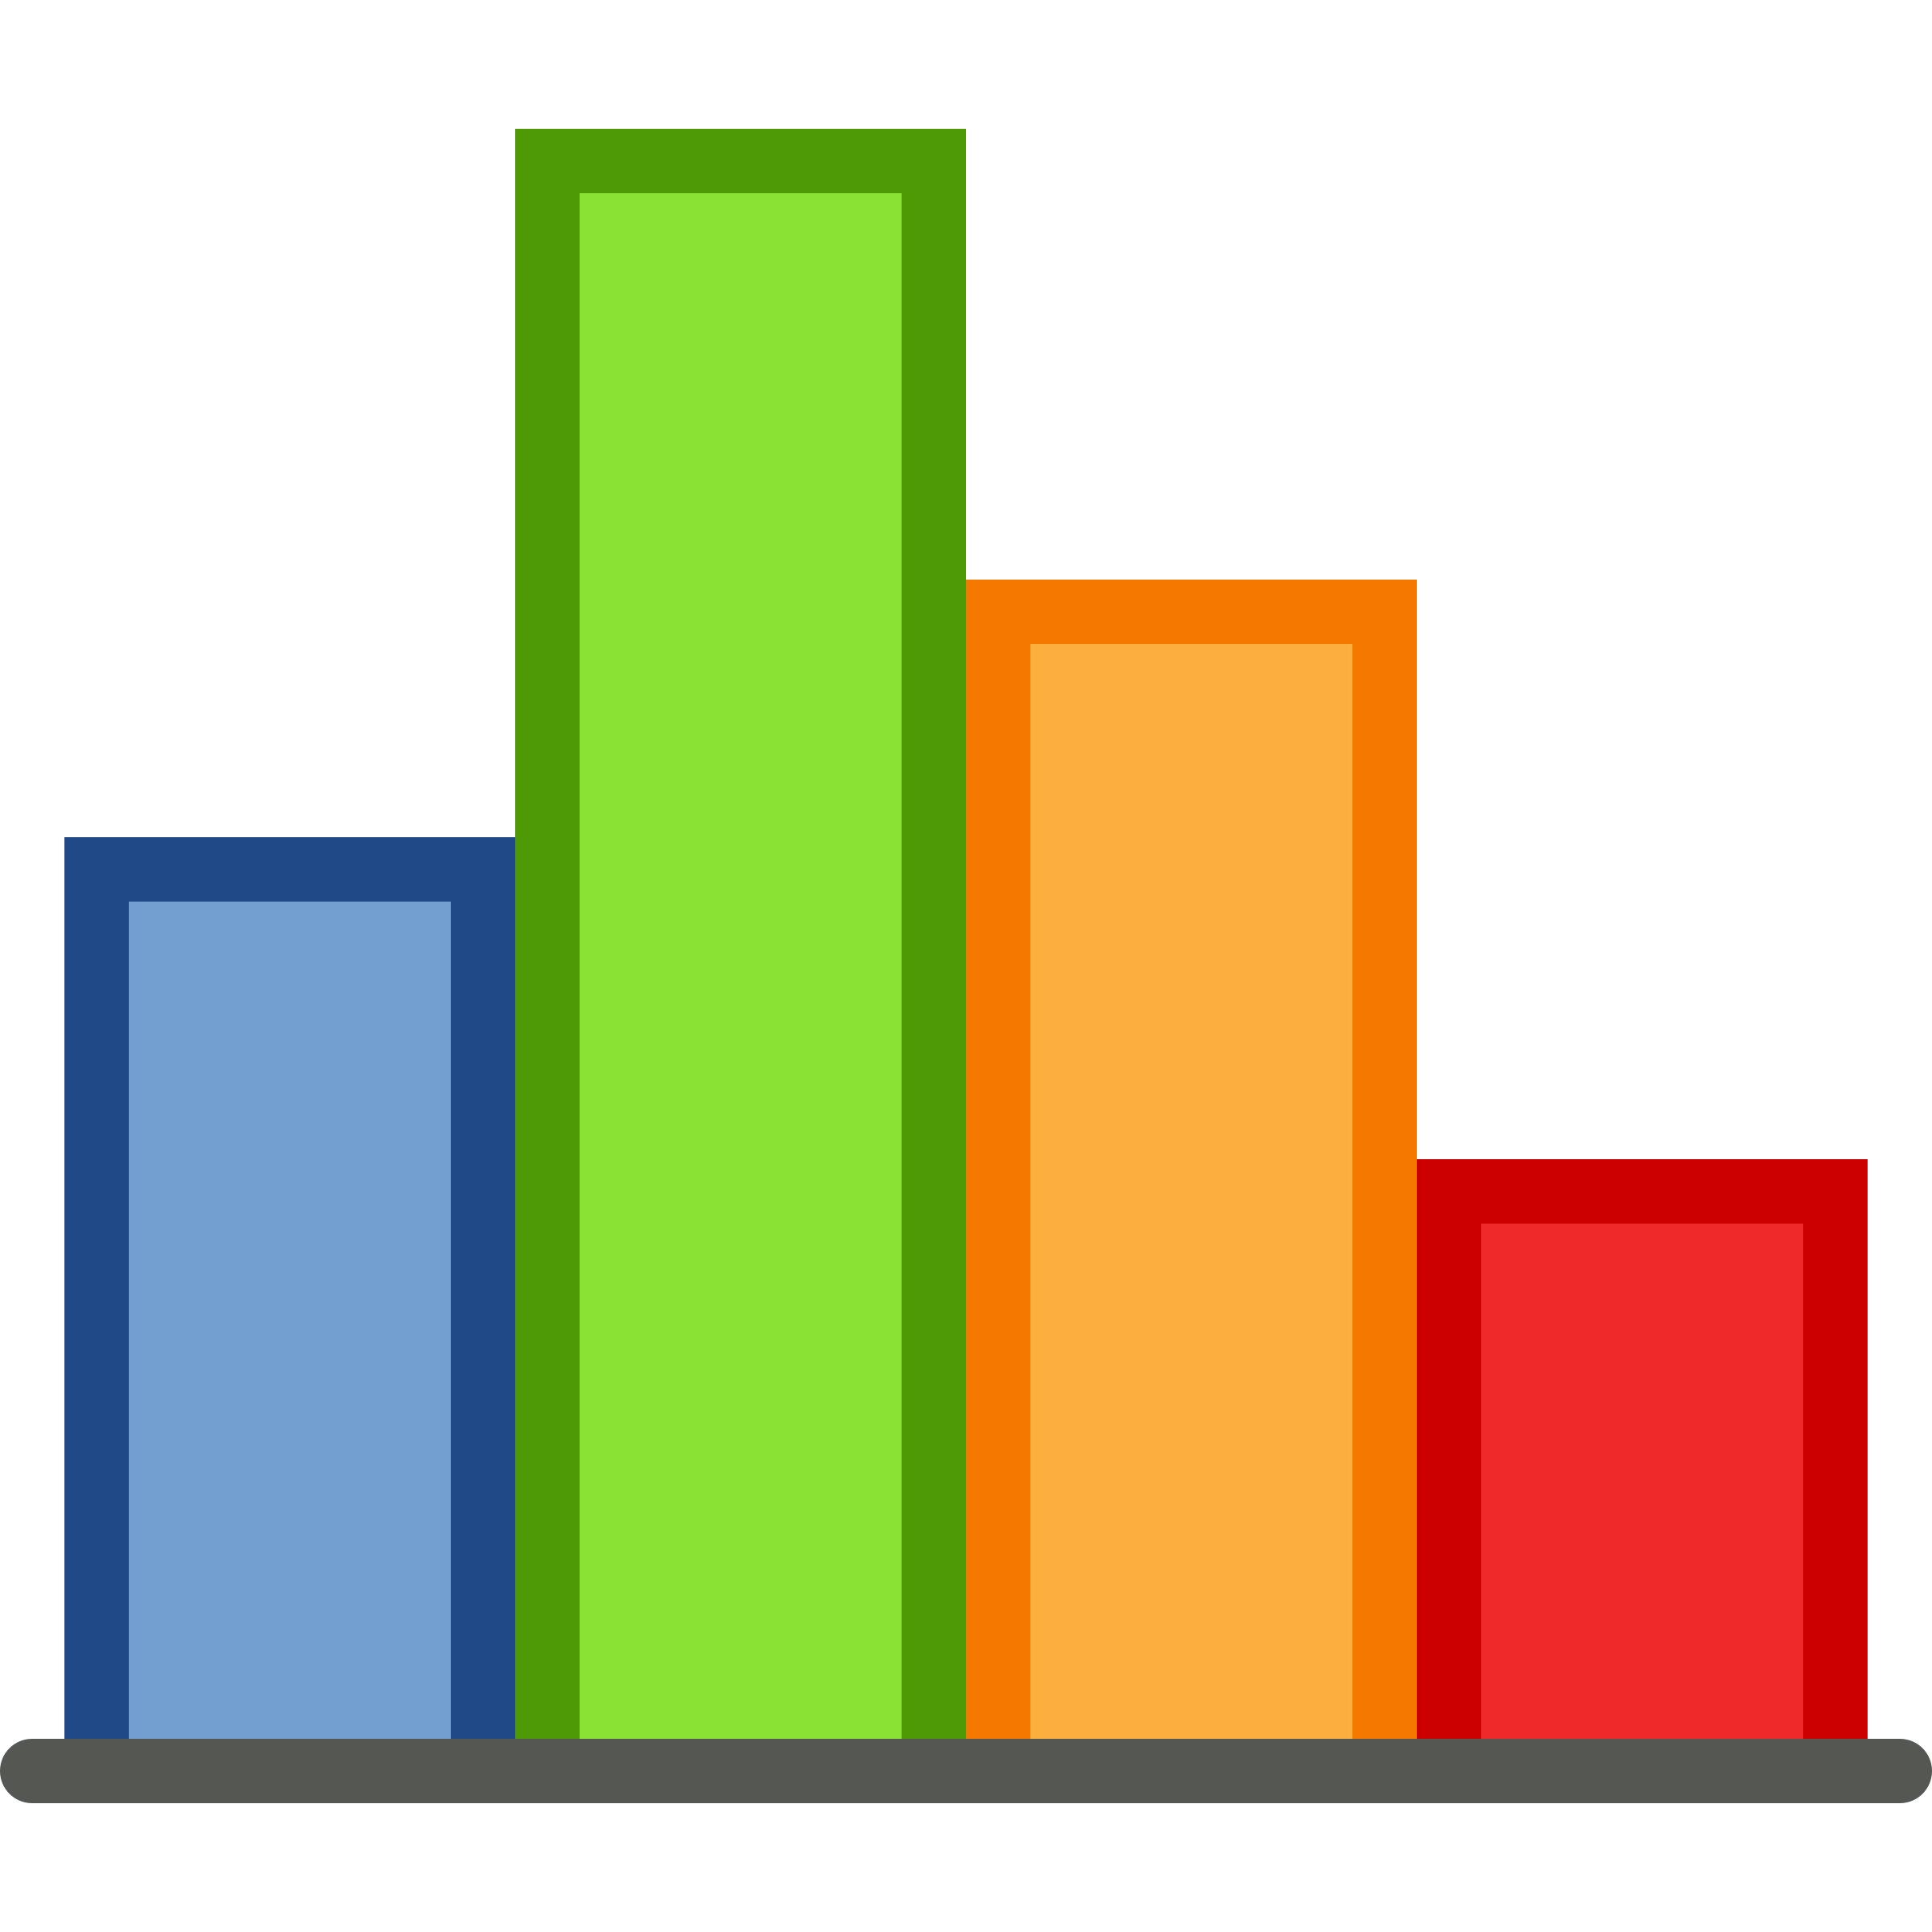 Economics clipart economics graph. Icon graphics big image